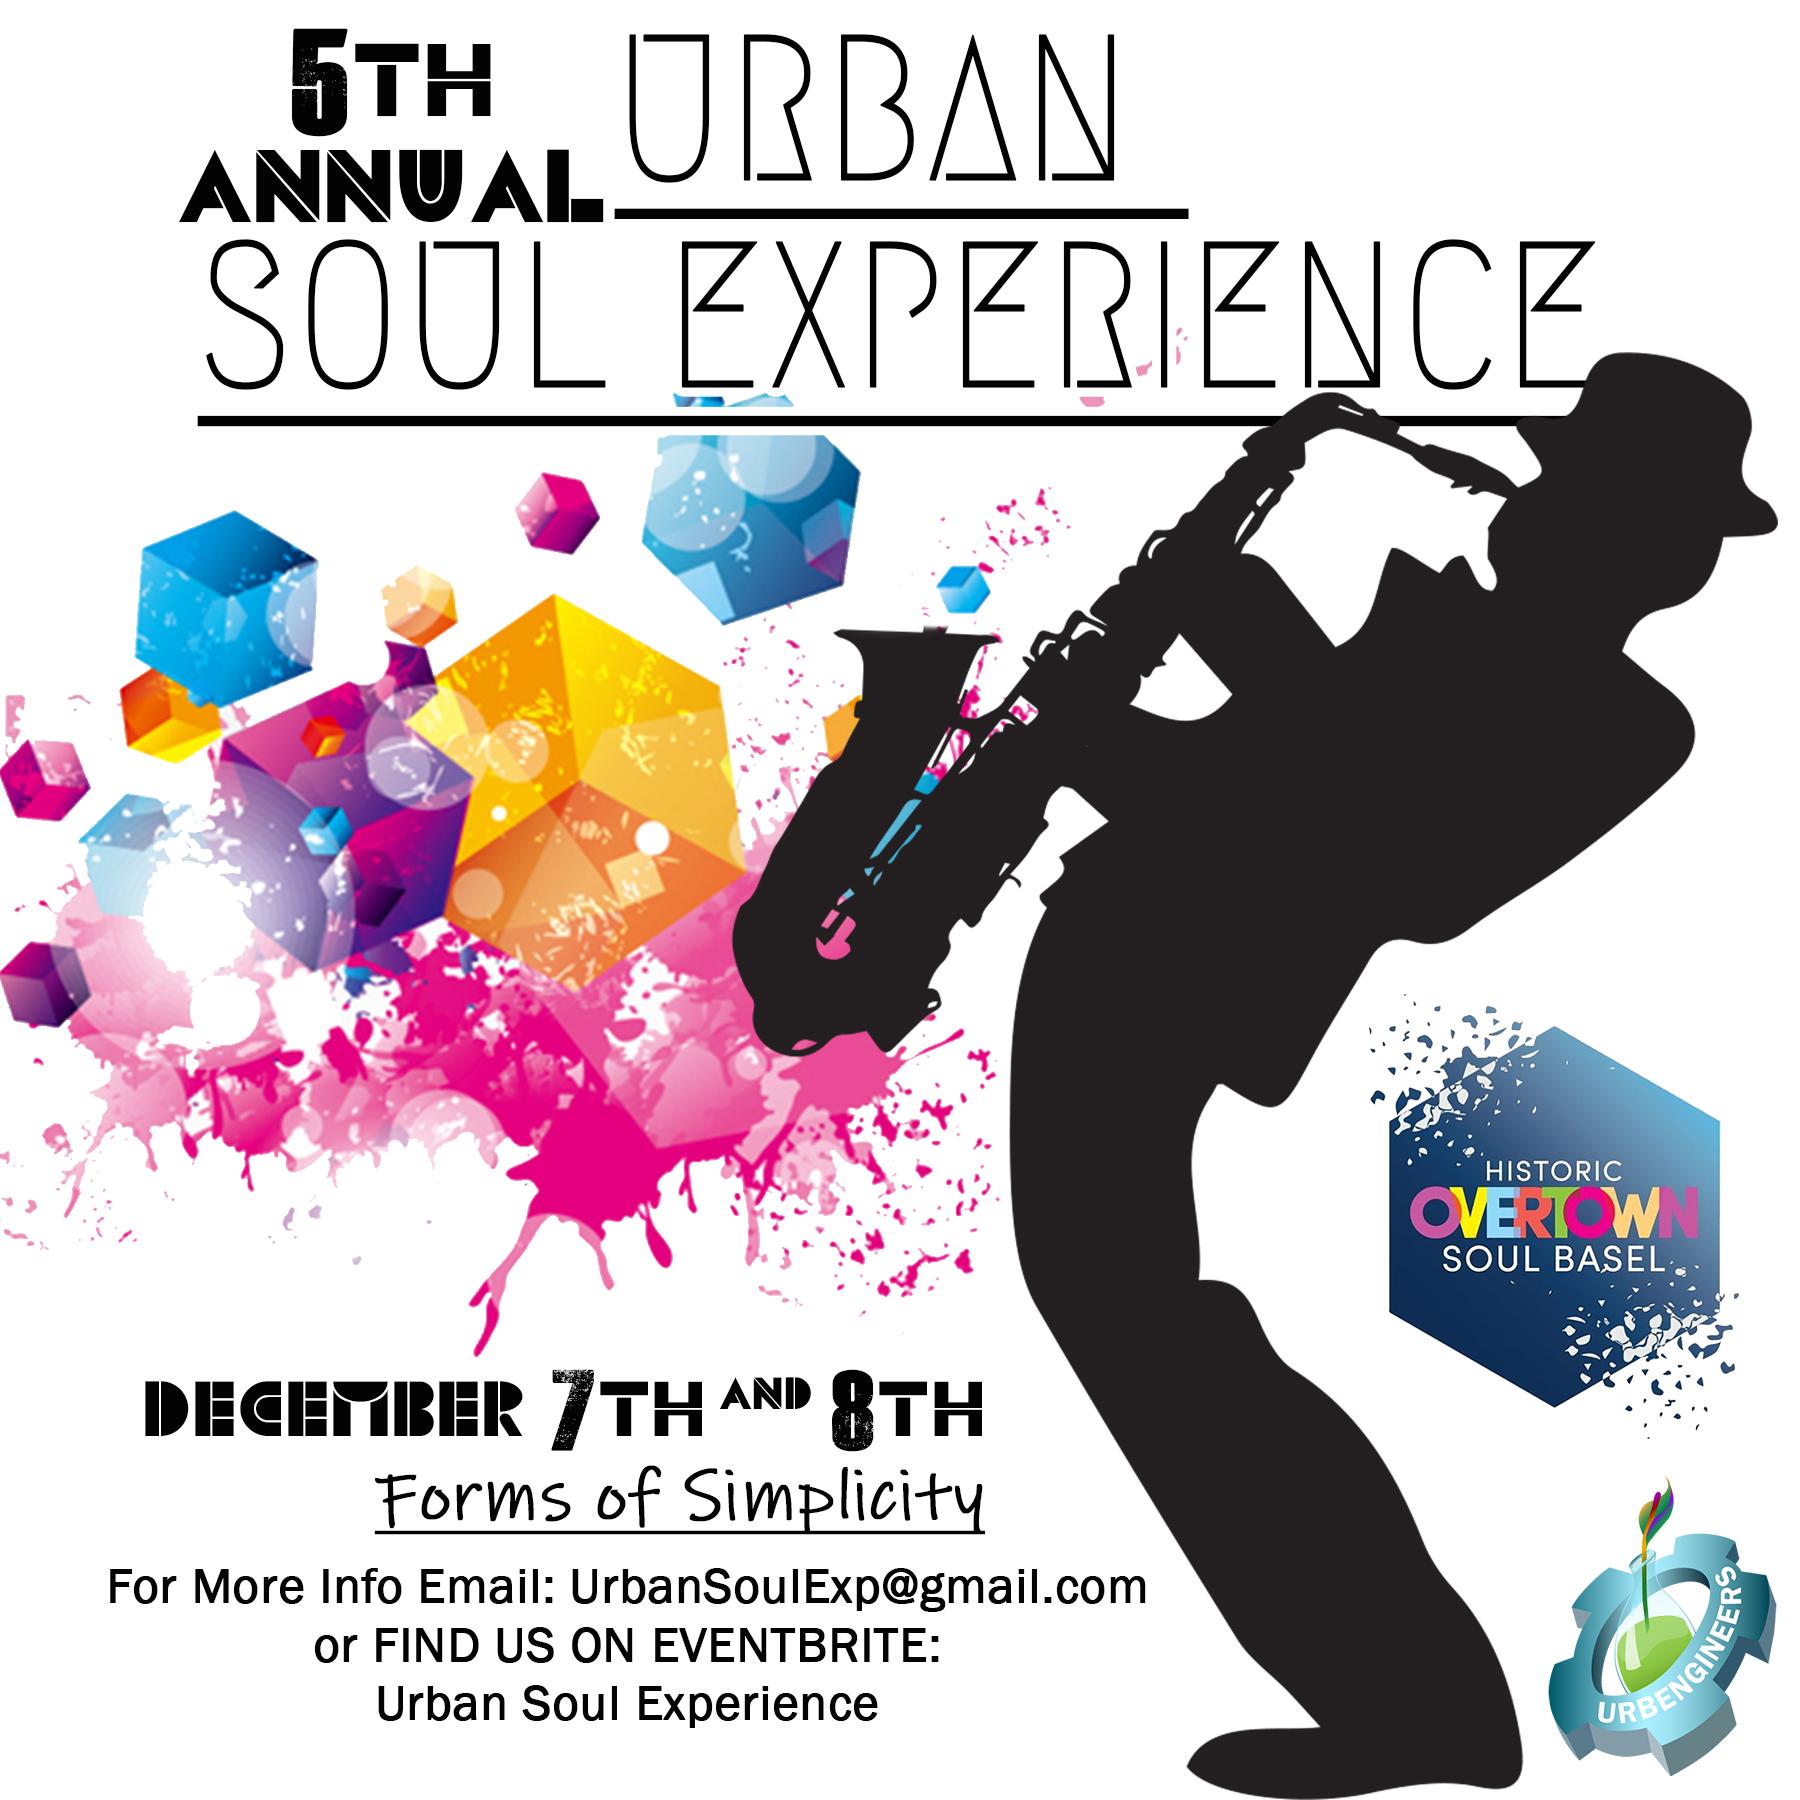 5th Annual Urban Soul Experience